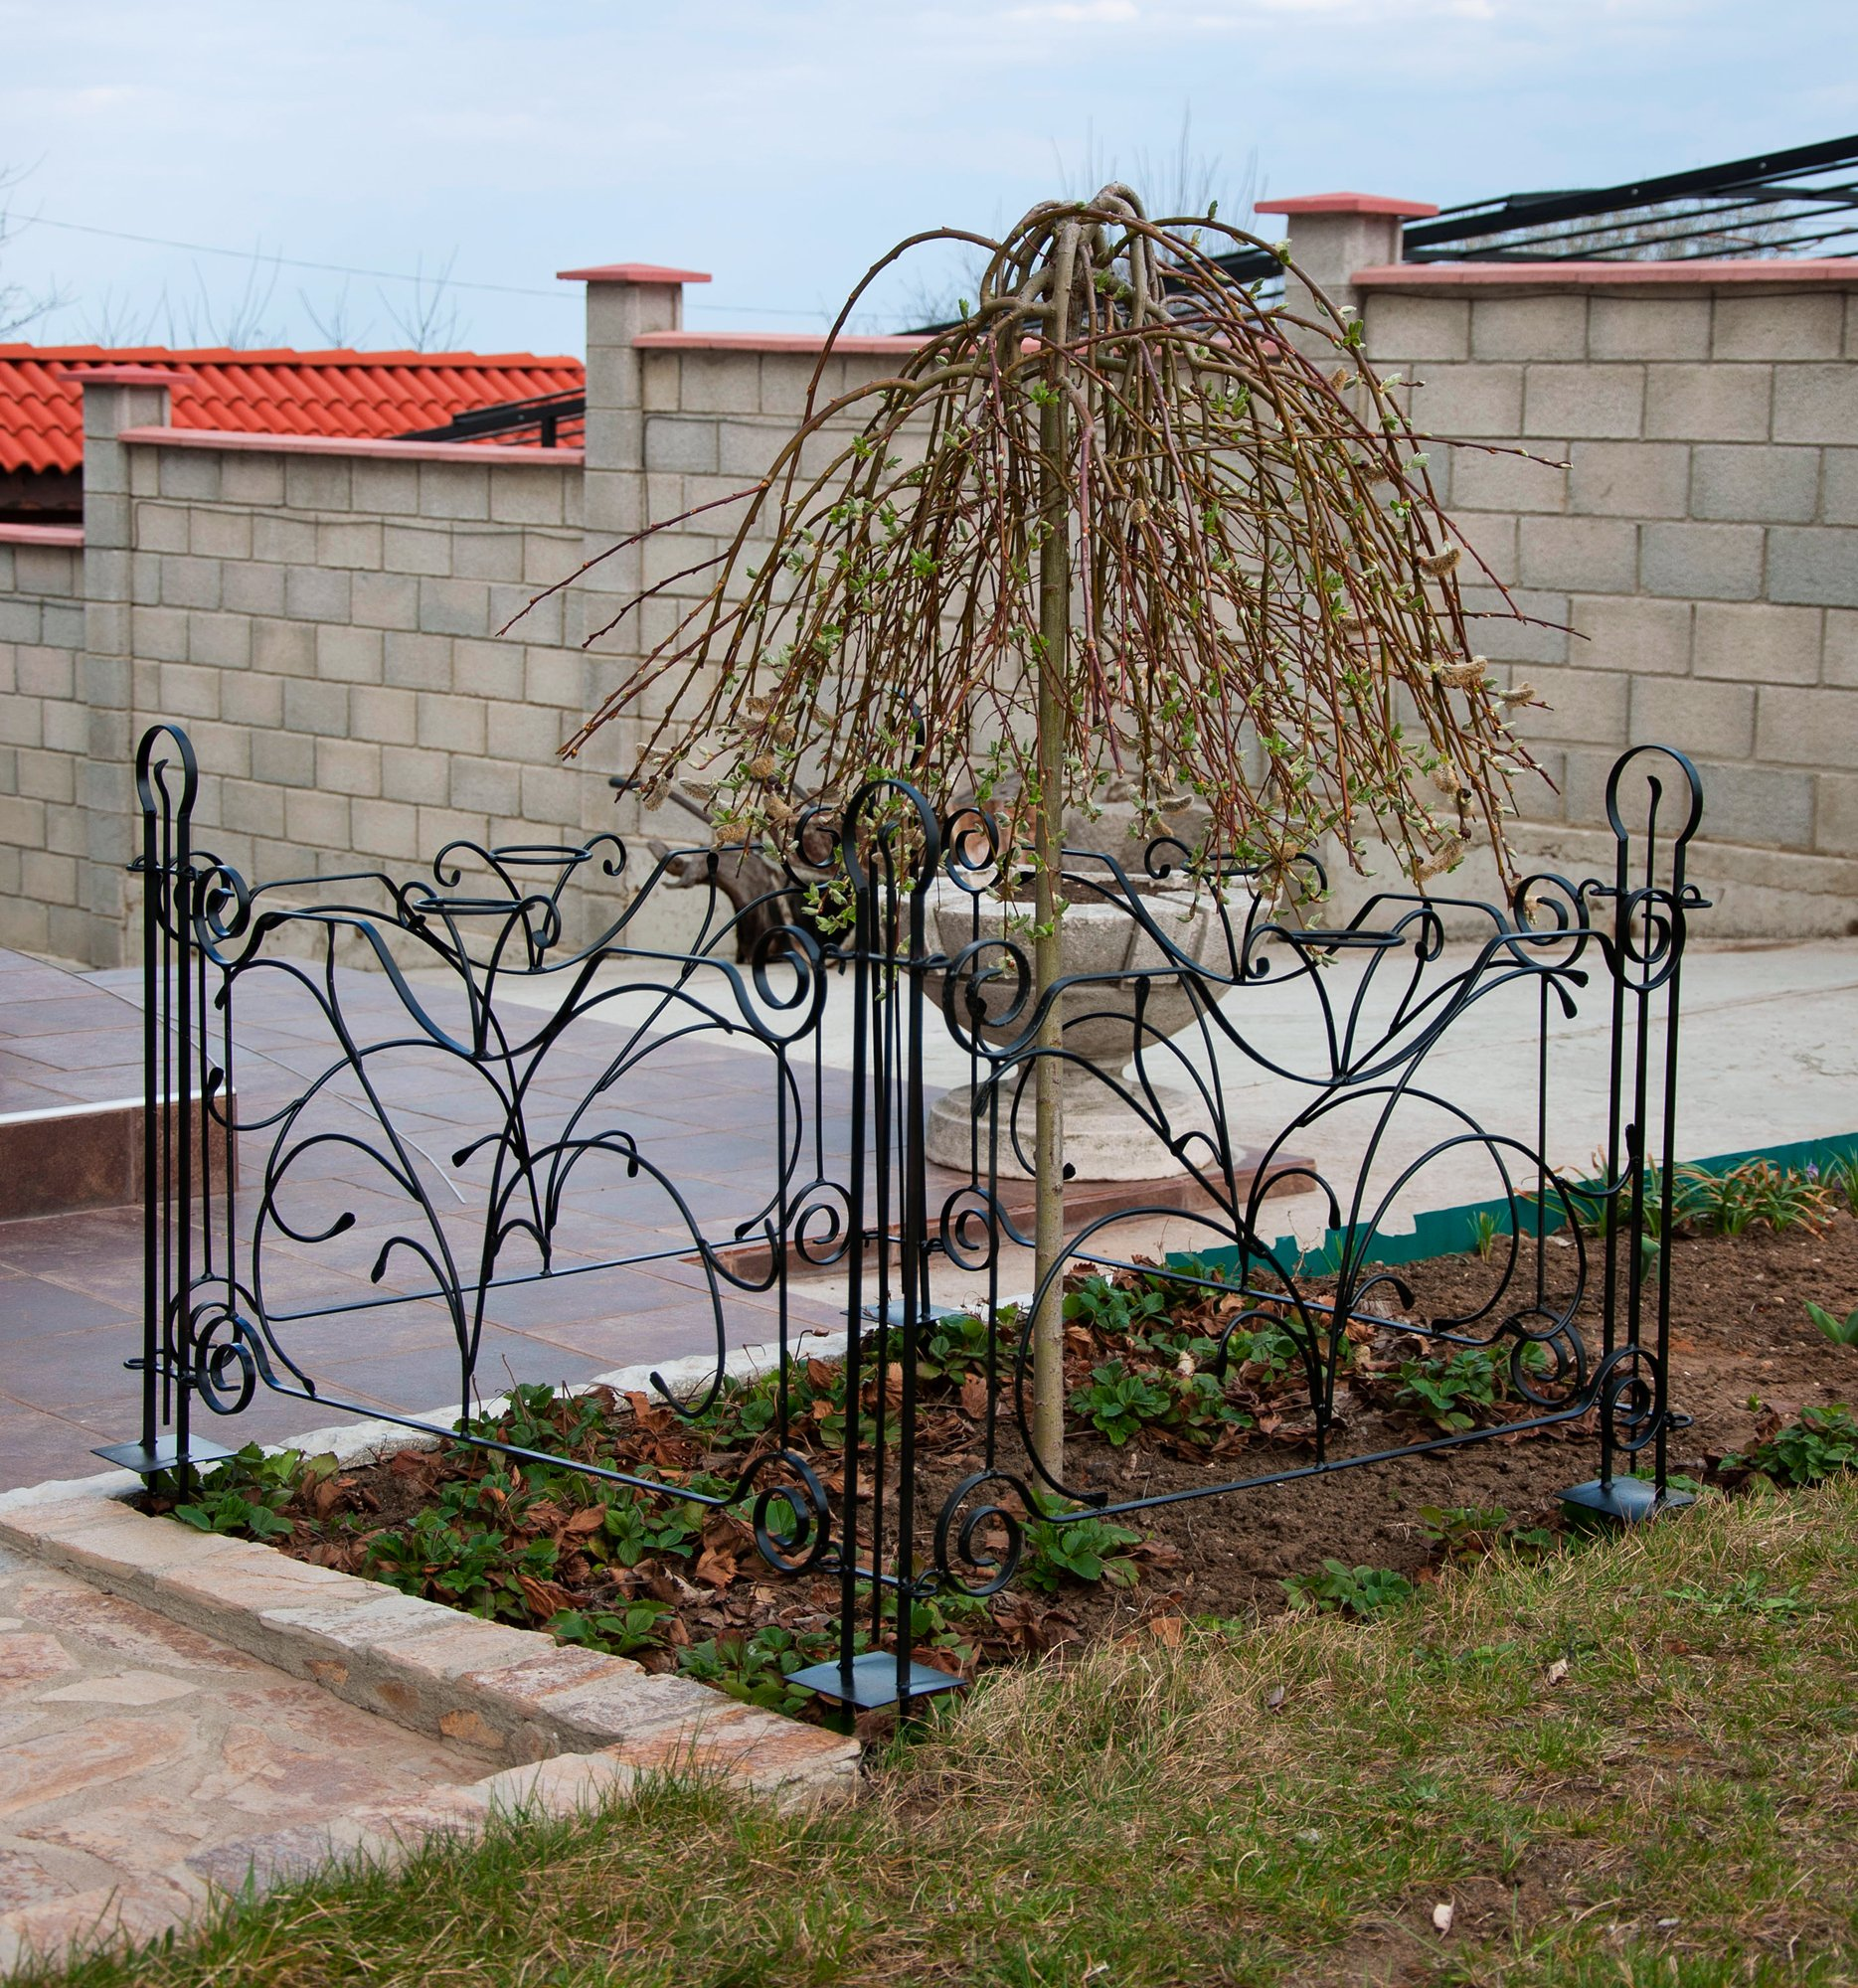 Designer Gartenzaun Dekor aunelement 90 cm Zaun Metall